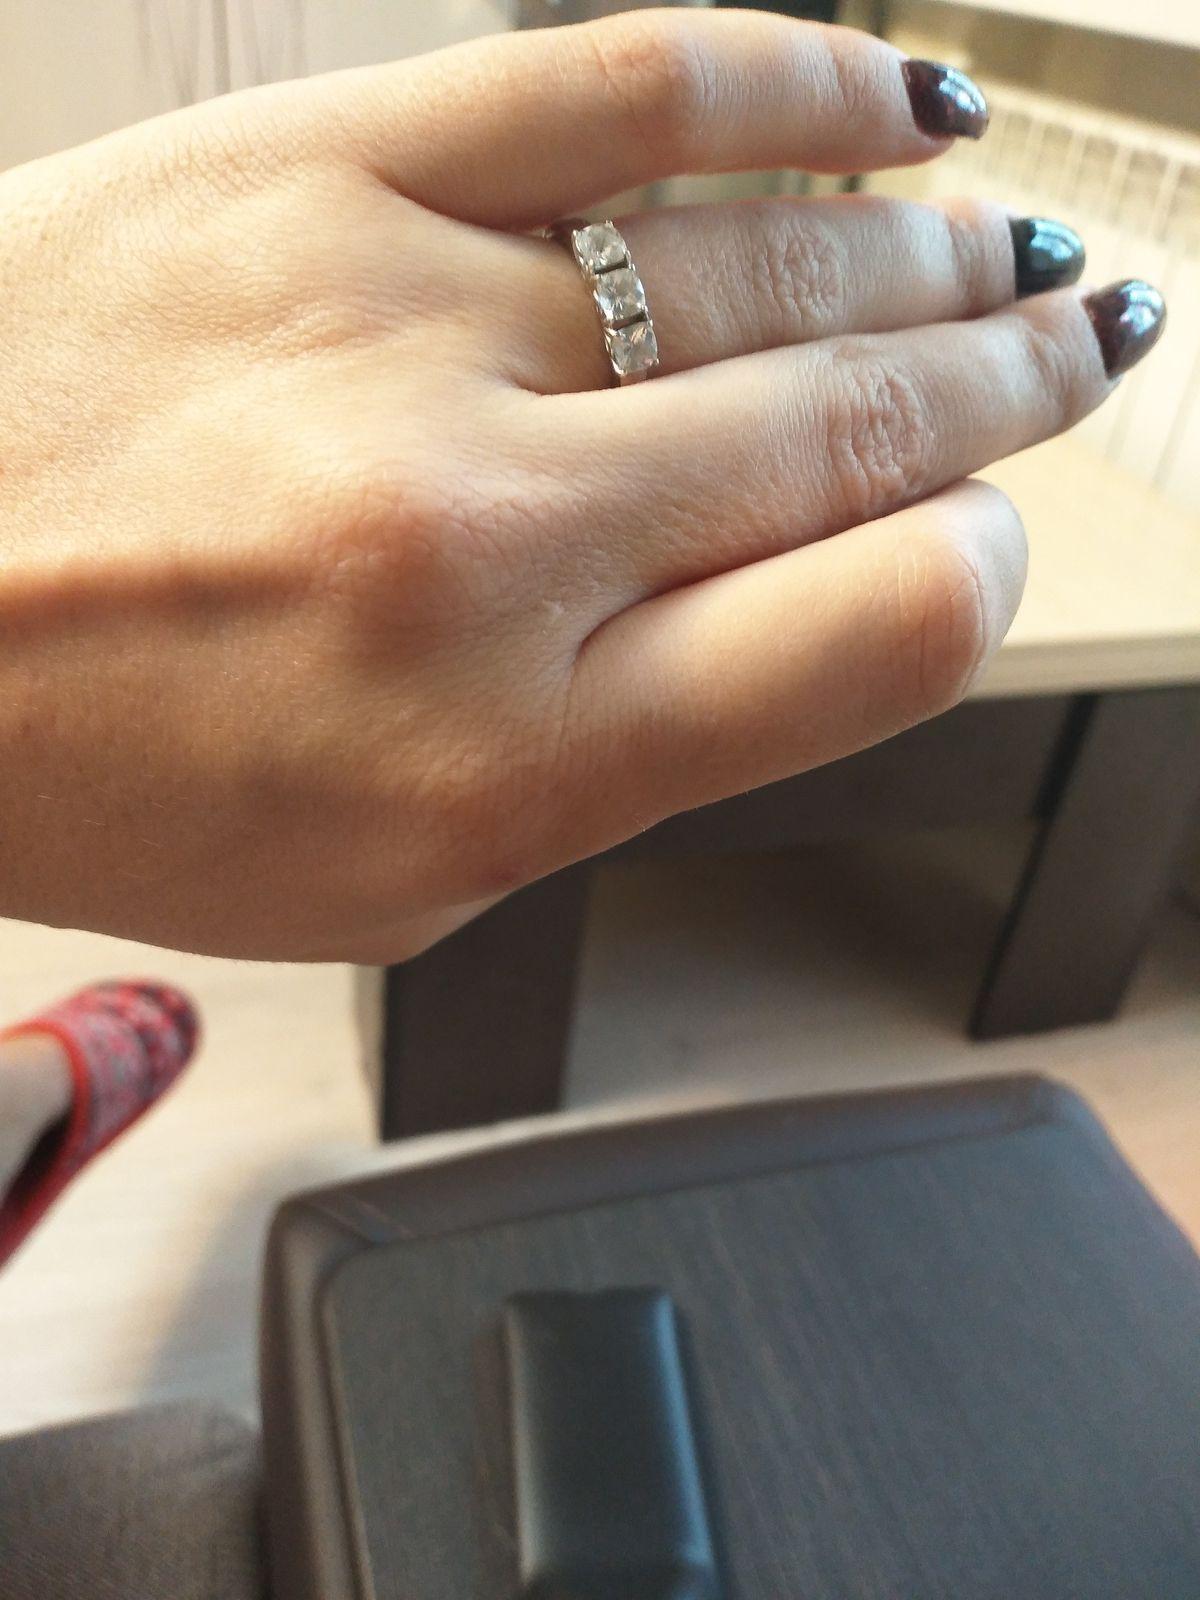 Красивое кольцо.